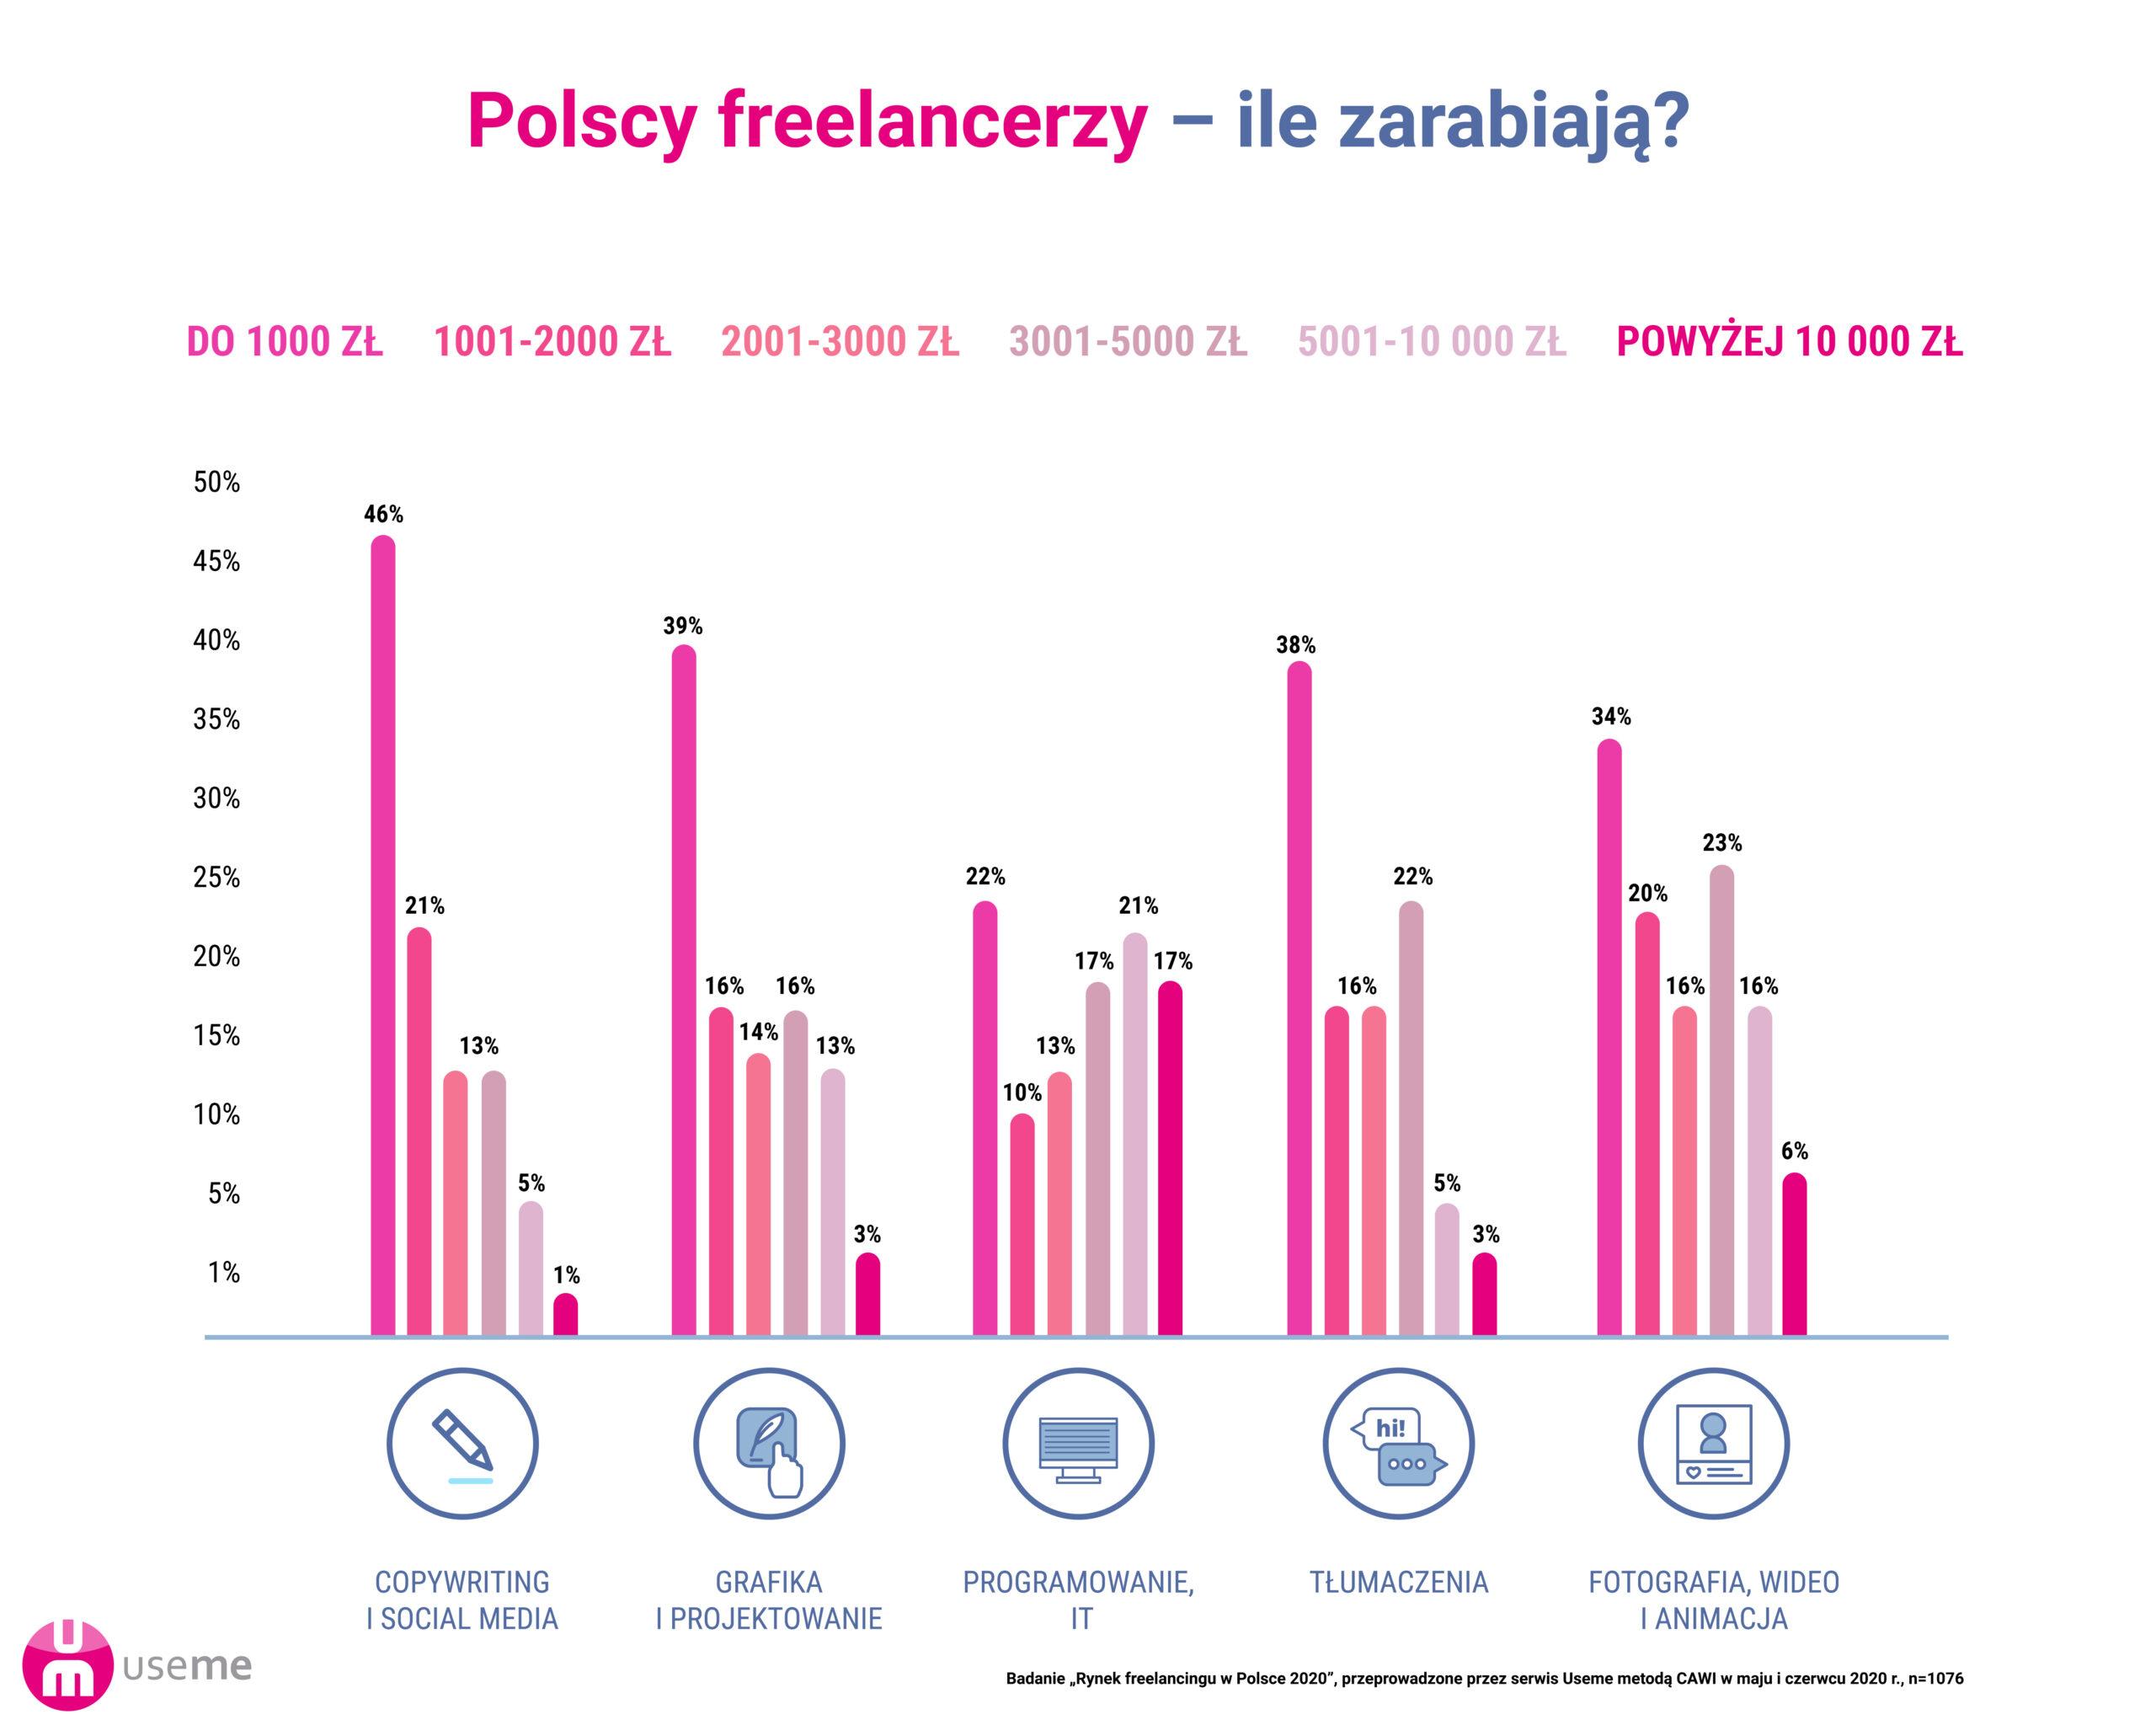 wykres_ileZarabiaja